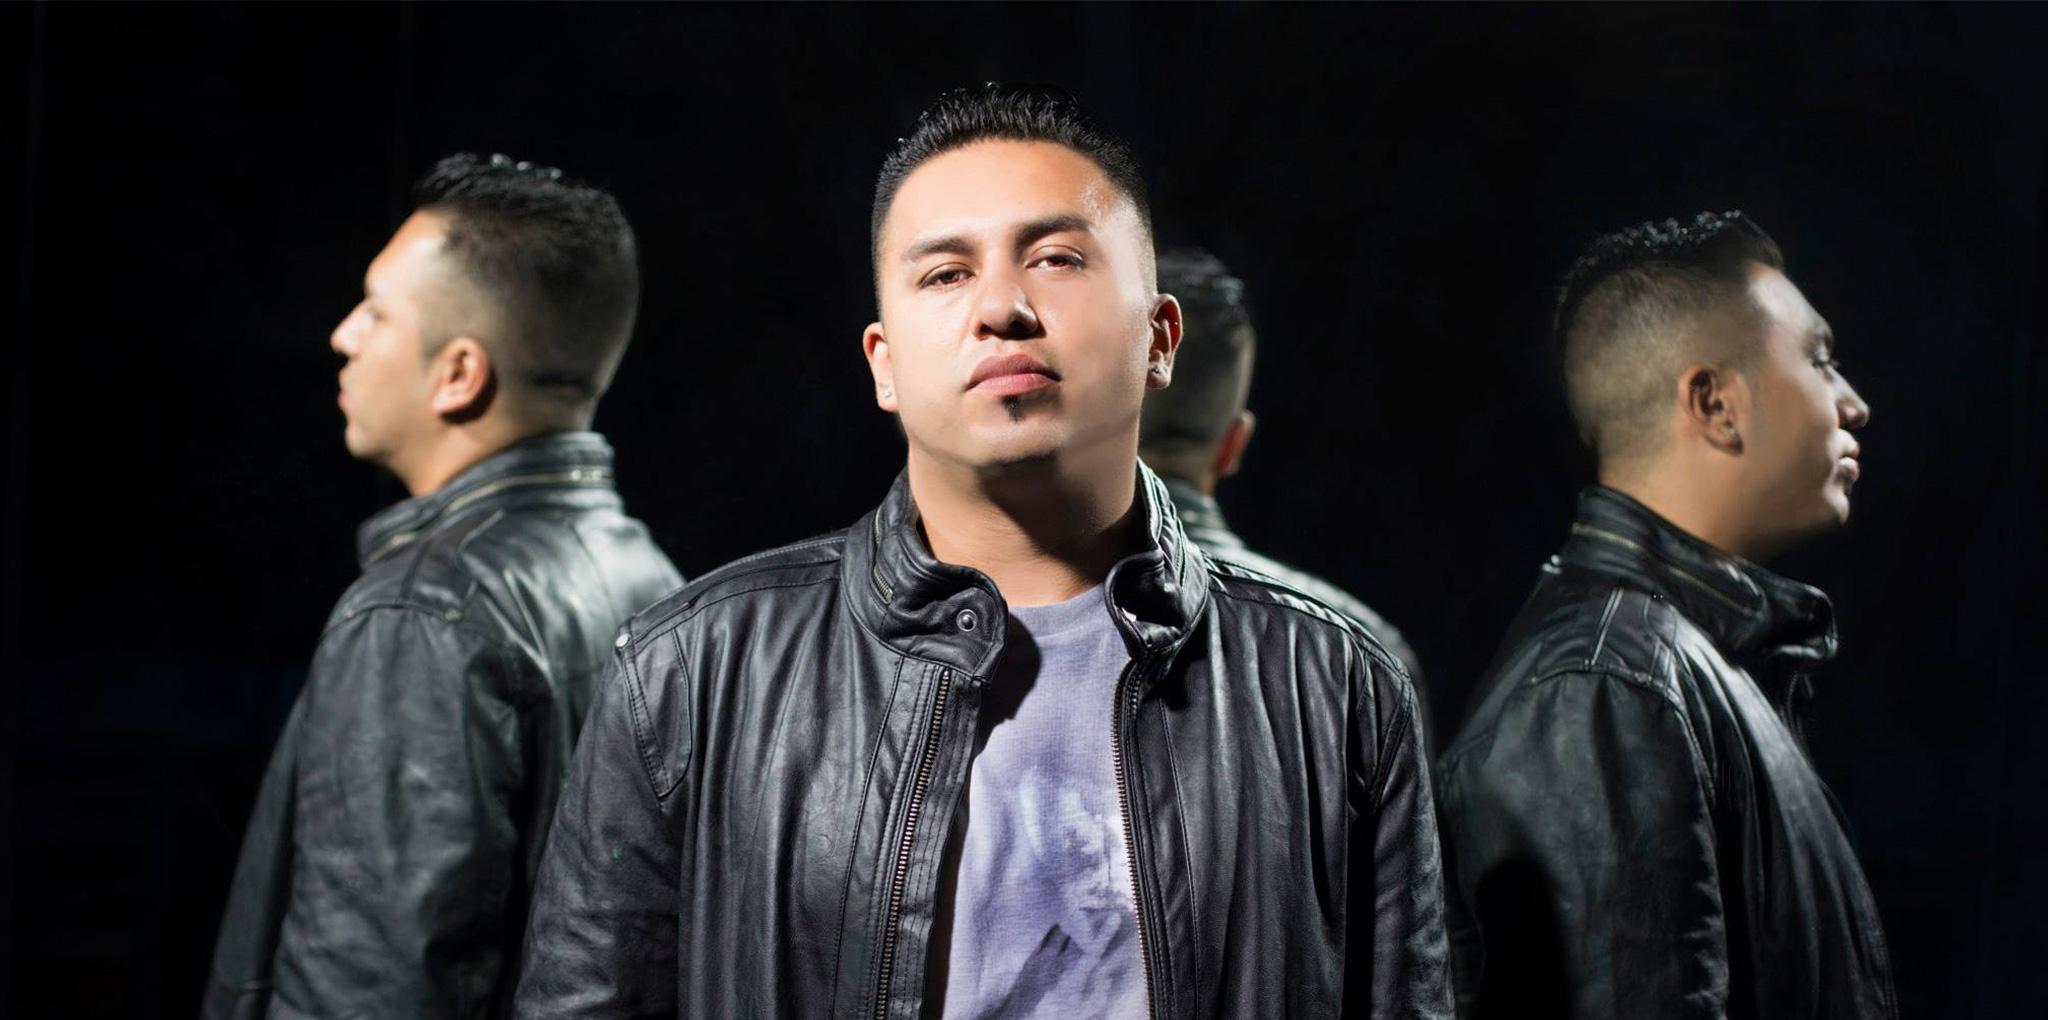 DJ IDeaL Image